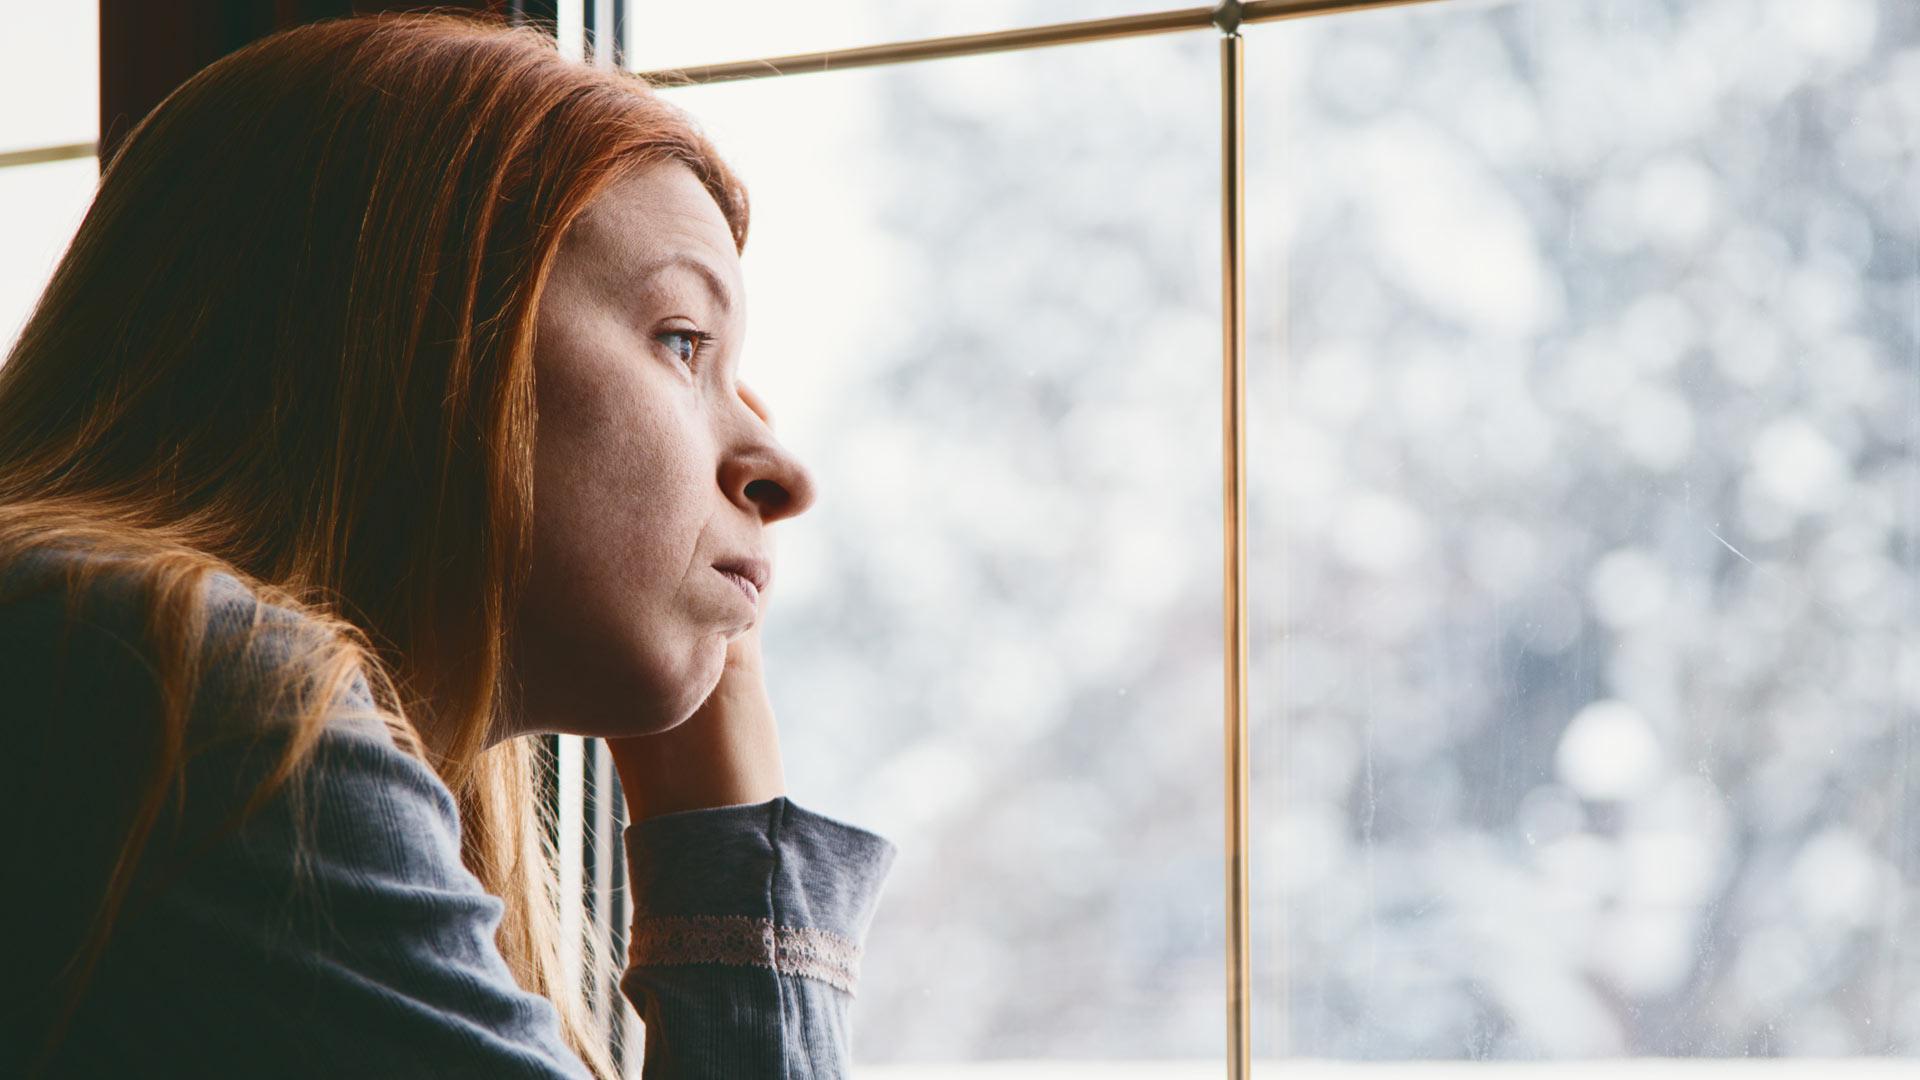 Adhd And Sad Treatment And Symptoms >> Seasonal Affective Disorder Adhd Symptoms And Treatment